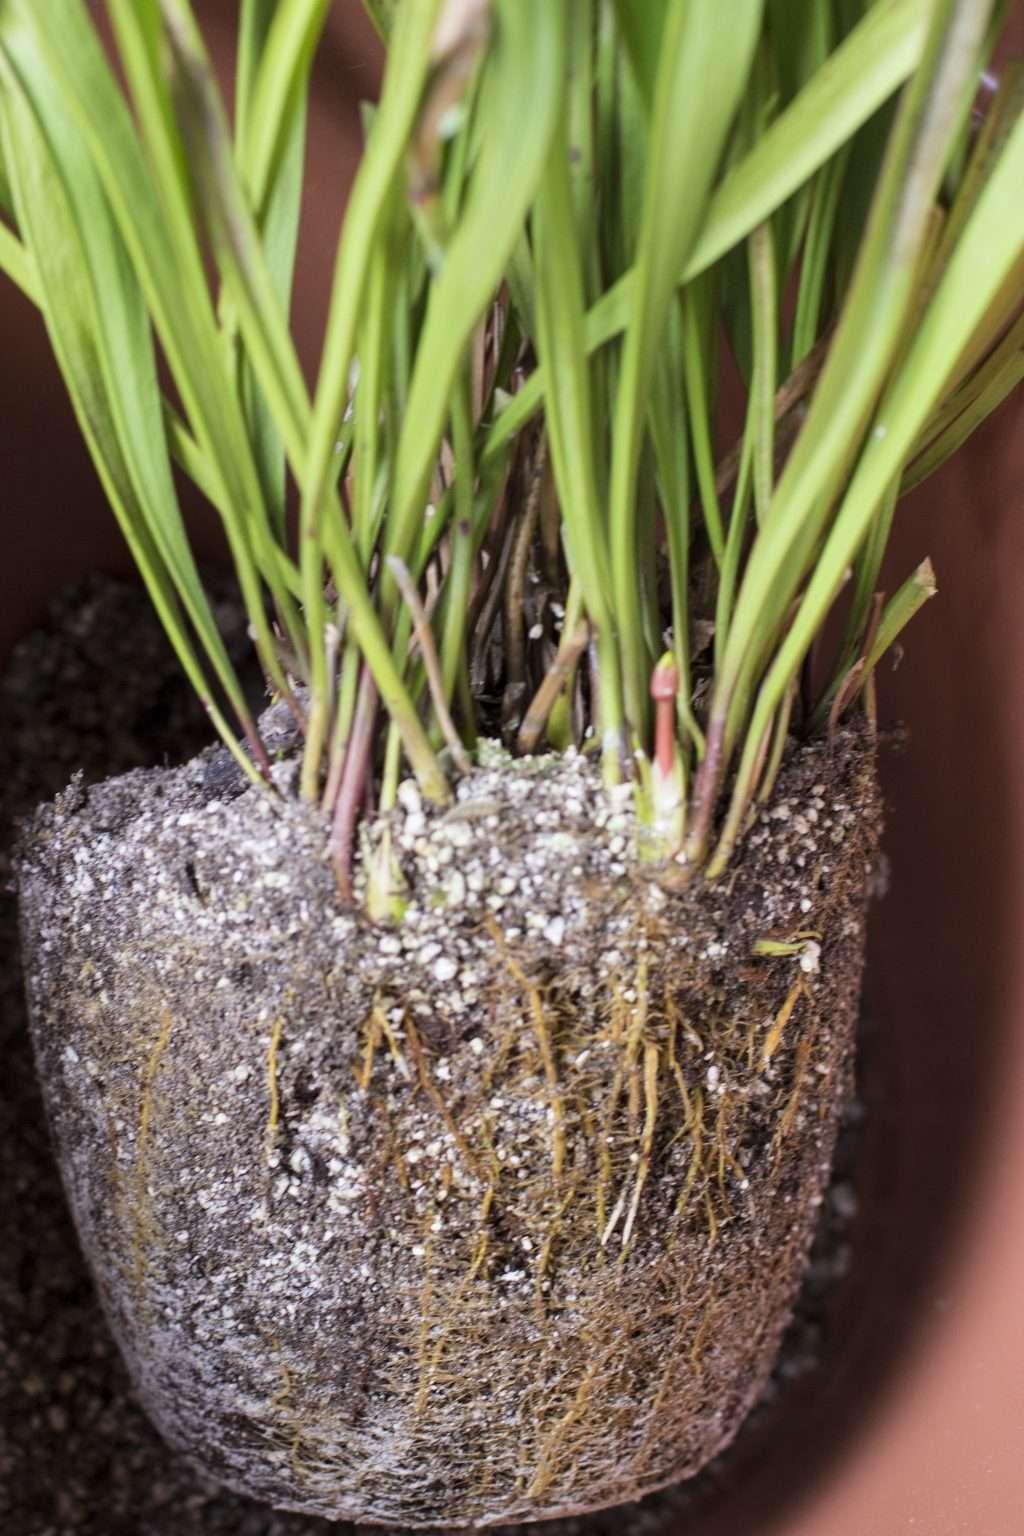 Sarracenia root ball